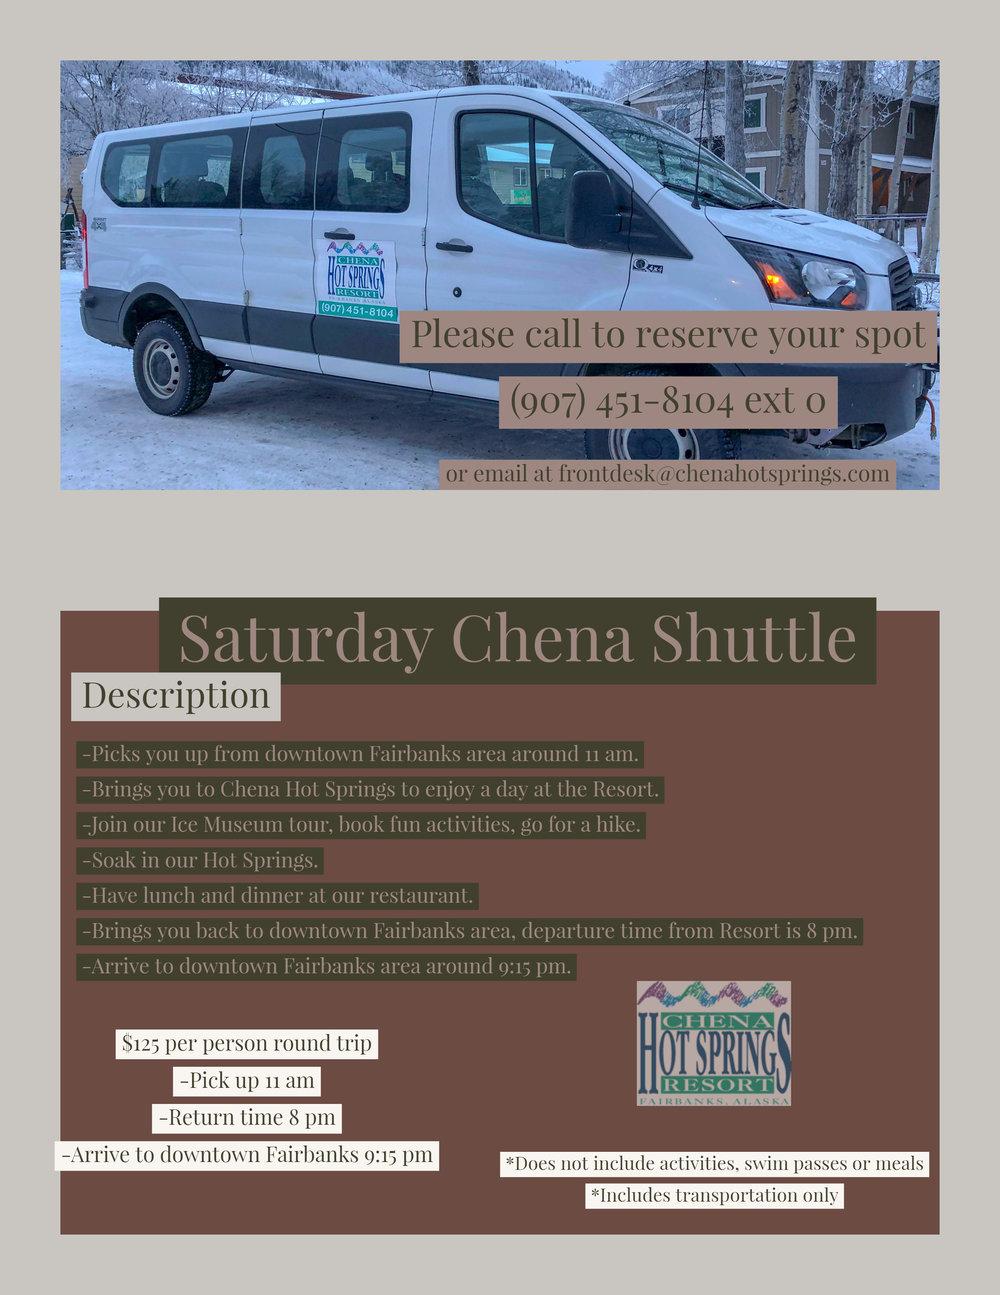 Saturday Chena Shuttle.jpg